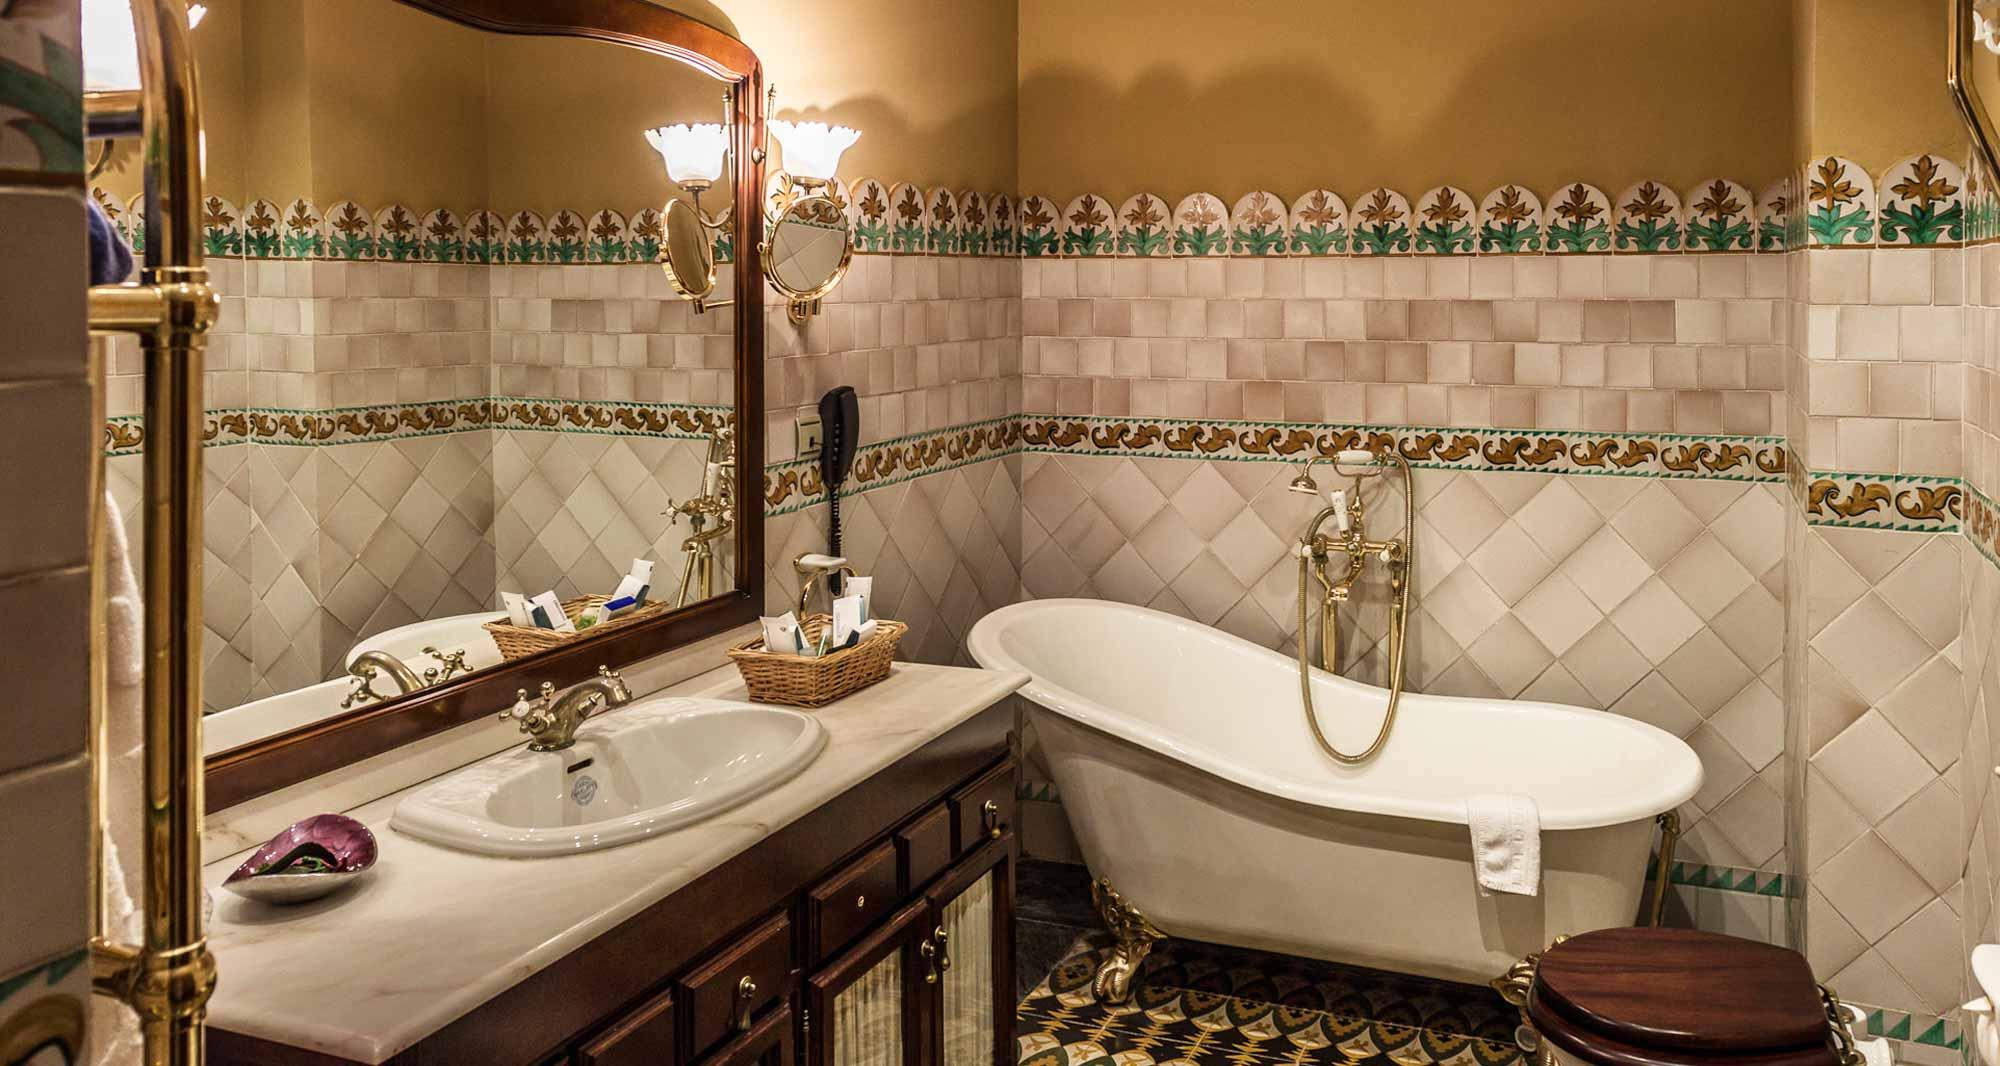 hotel-villa-retiro-5-estrellas-clasico-colonial-modernista-terres-del-ebre-